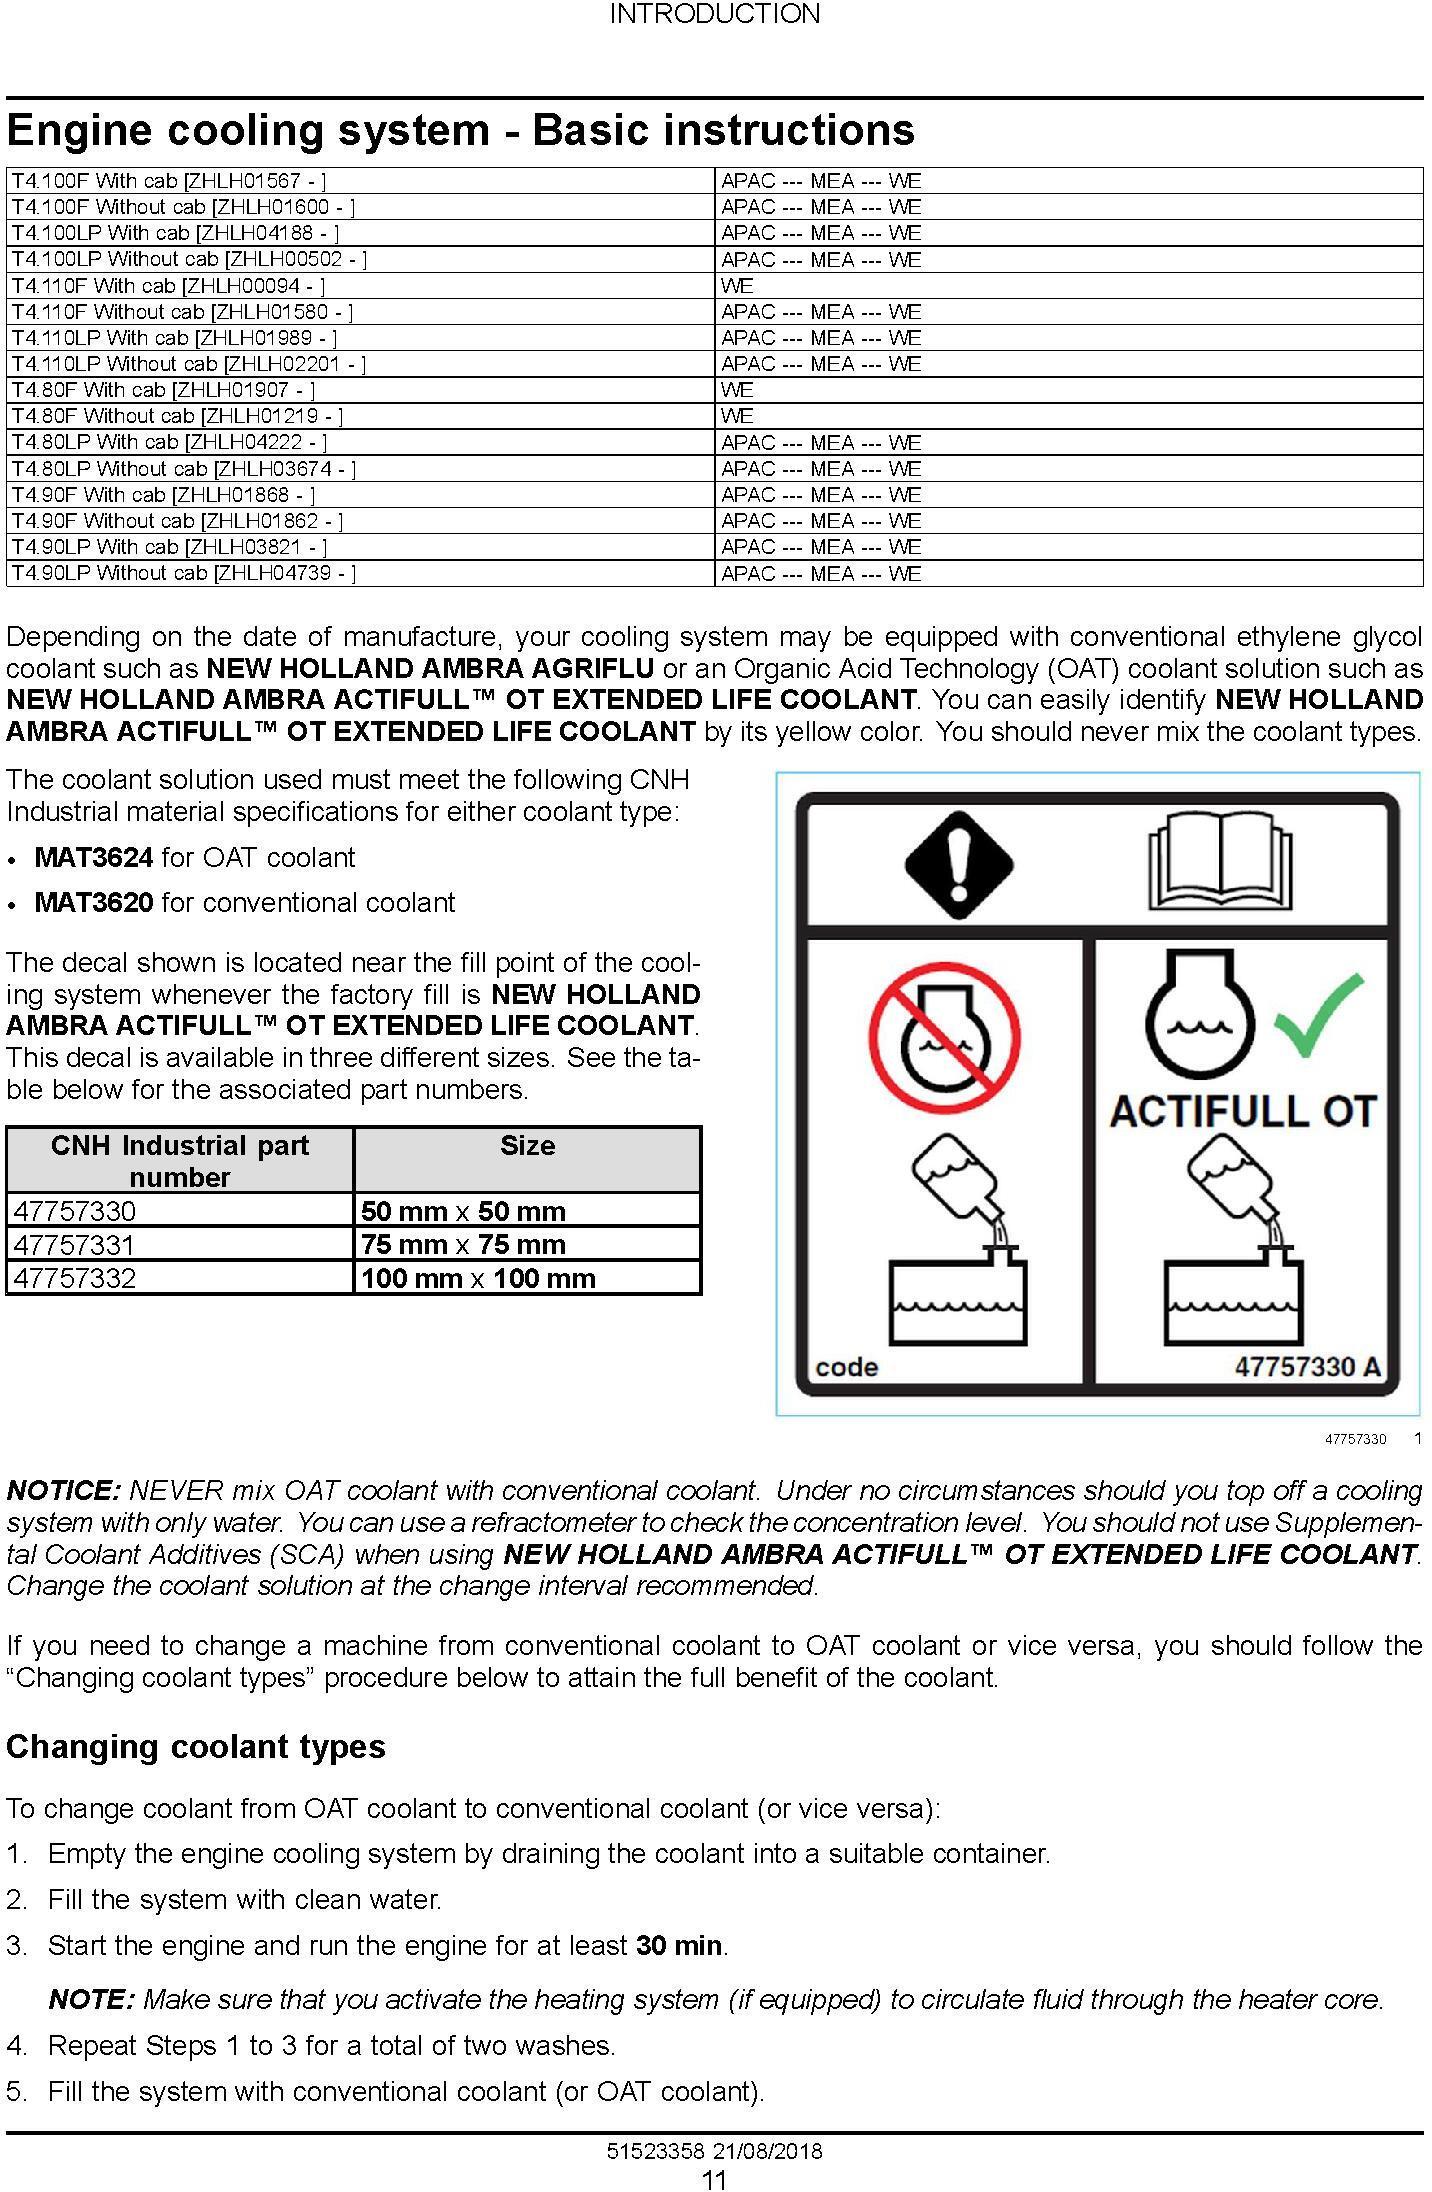 New Holland T4.80F/LP, T4.90F/LP, T4.100F/LP, T4.110F/LP Tractor Service Manual (Europe,Asia,Africa) - 1